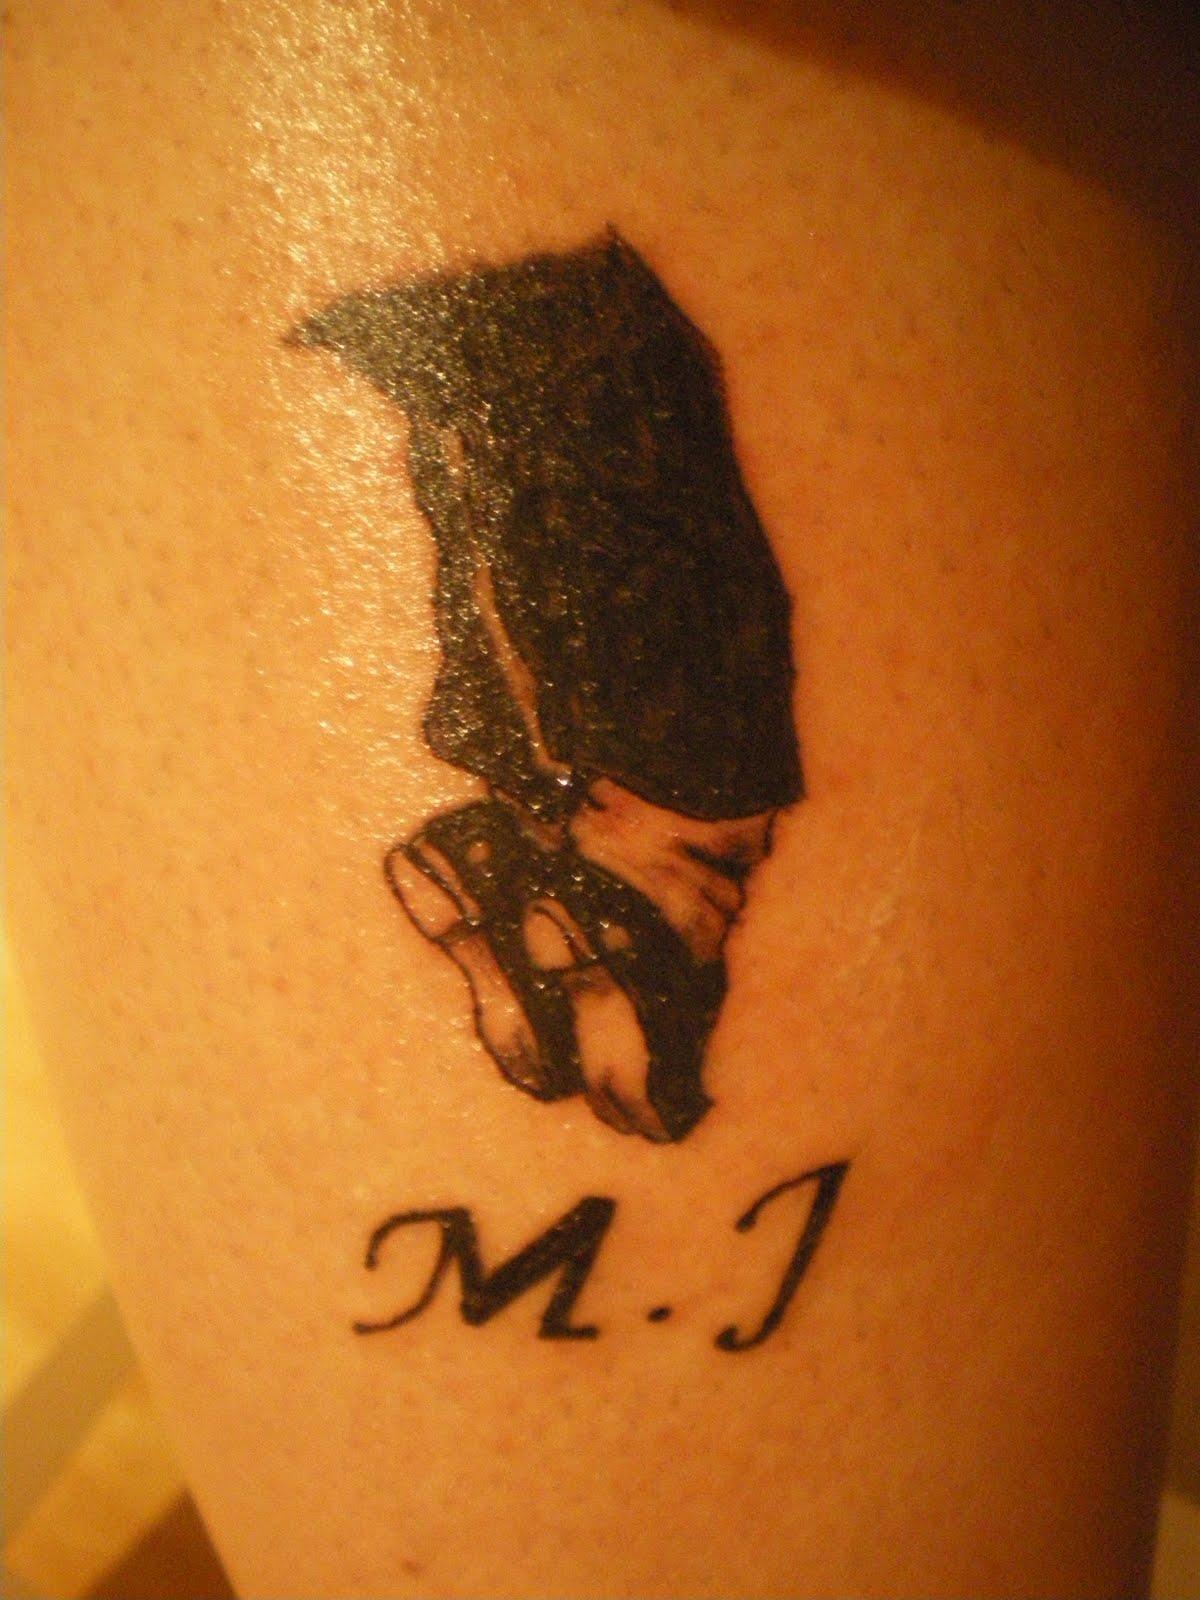 http://2.bp.blogspot.com/_u_Dw9Bwo8nQ/S8oIdj_nRXI/AAAAAAAAAFI/SuOka_Qcuys/s1600/Michael+Jackson+tattoo.JPG